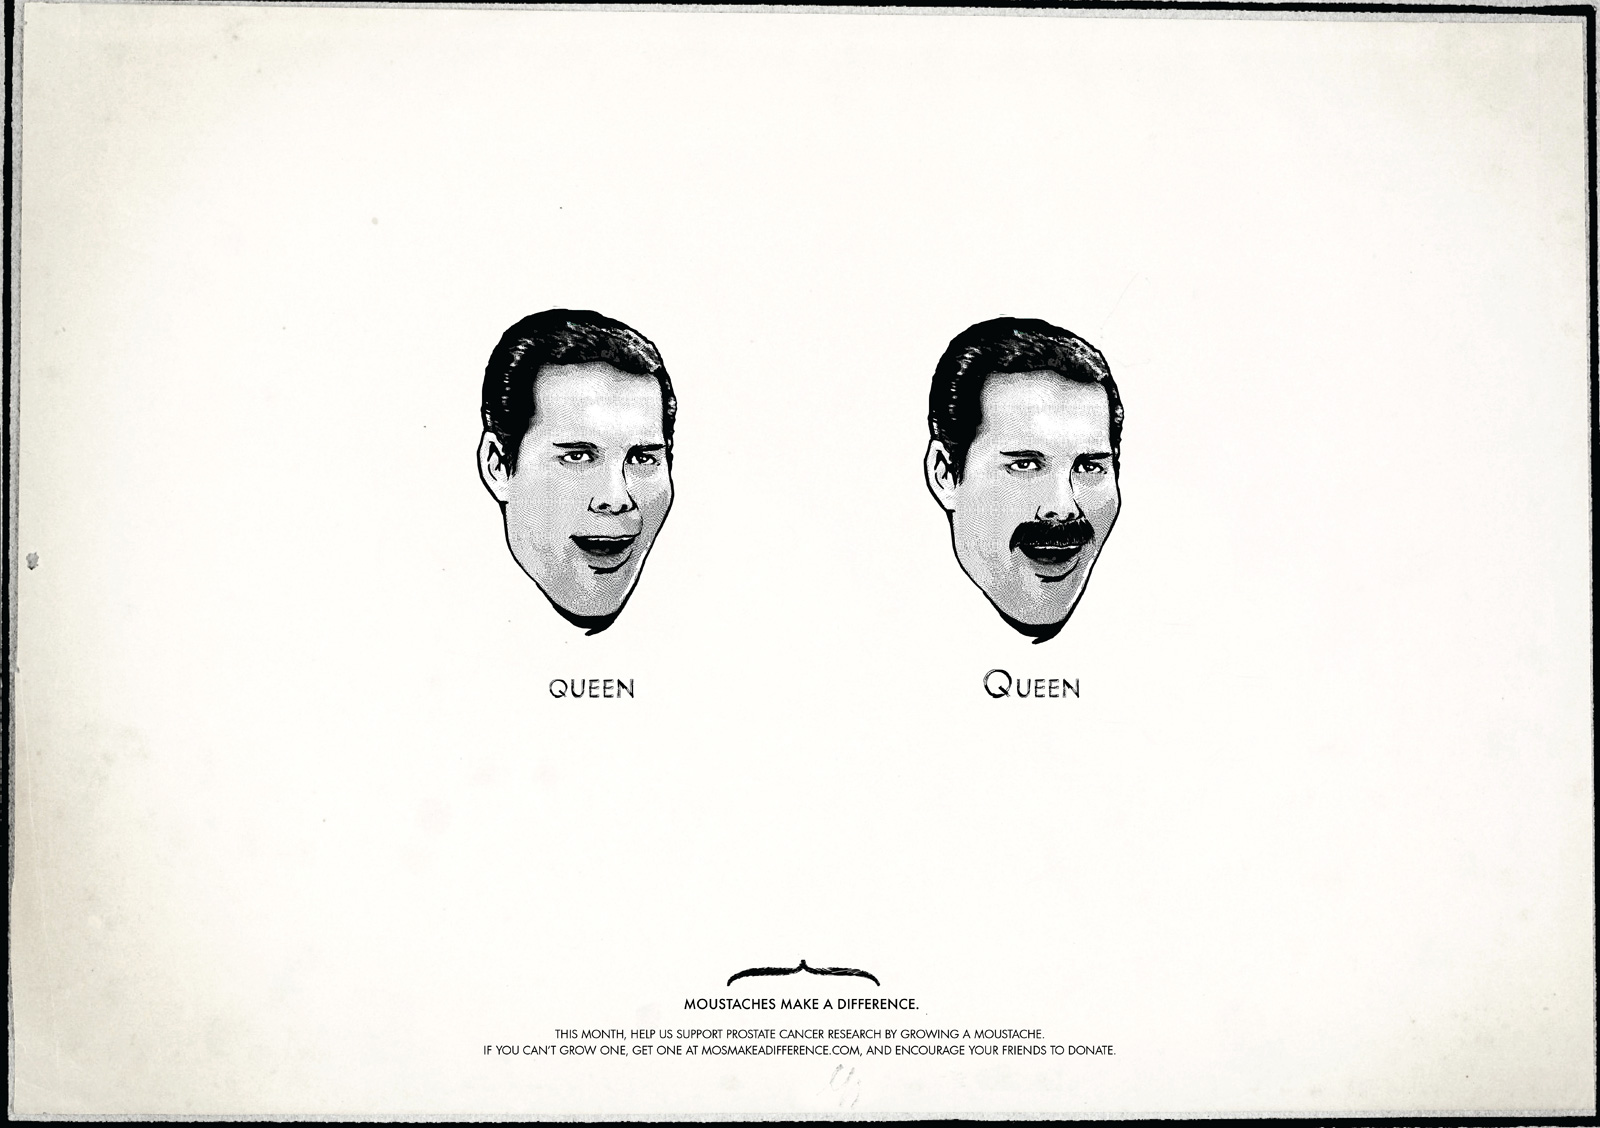 http://3.bp.blogspot.com/_42nL05s3A-8/TNnyYtLZvFI/AAAAAAAADB4/_i9HzyQ5bzA/s1600/Moustaches-Make-A-Difference-freddie.jpg